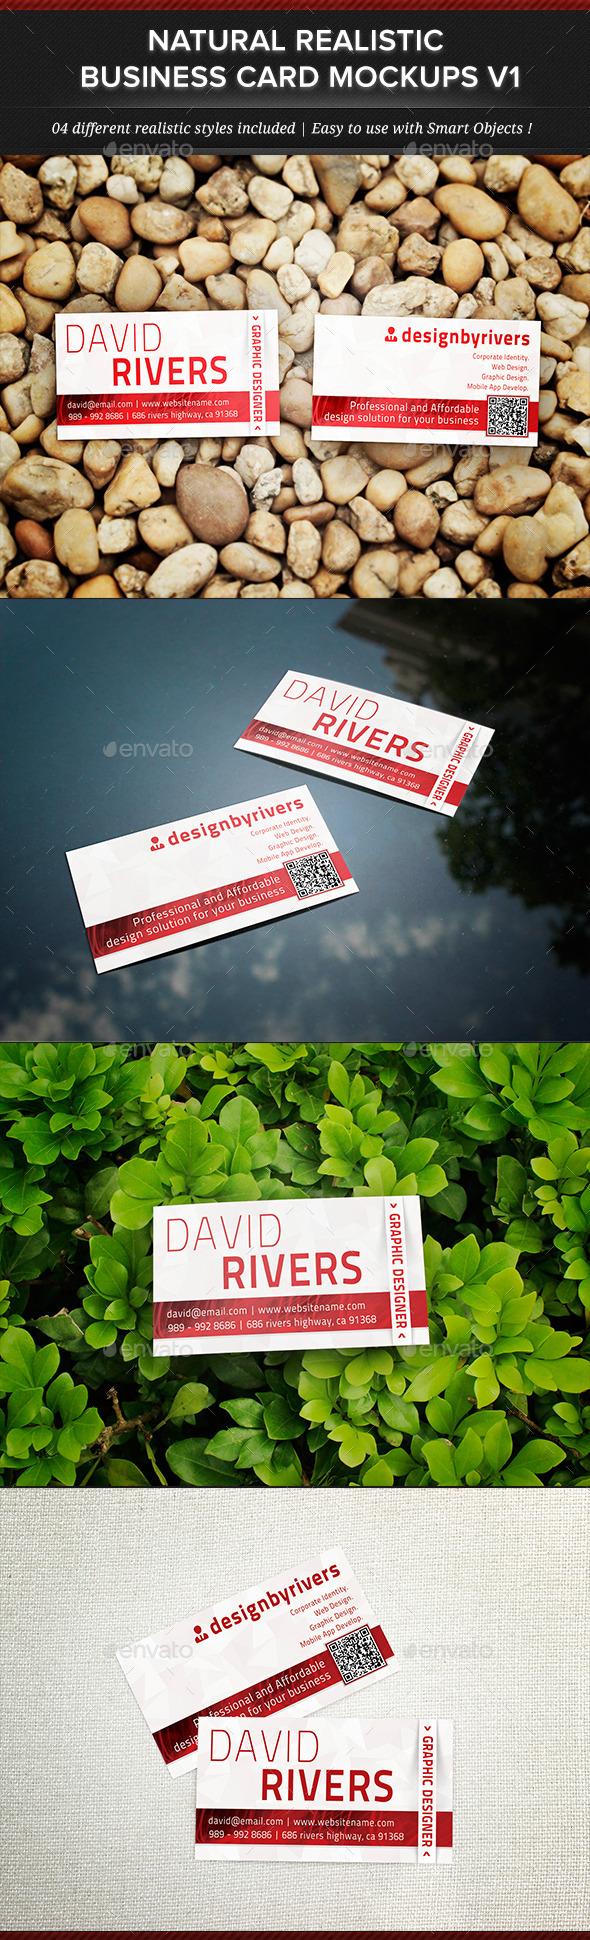 GraphicRiver Natural Realistic Business Card Mockup V1 11772812